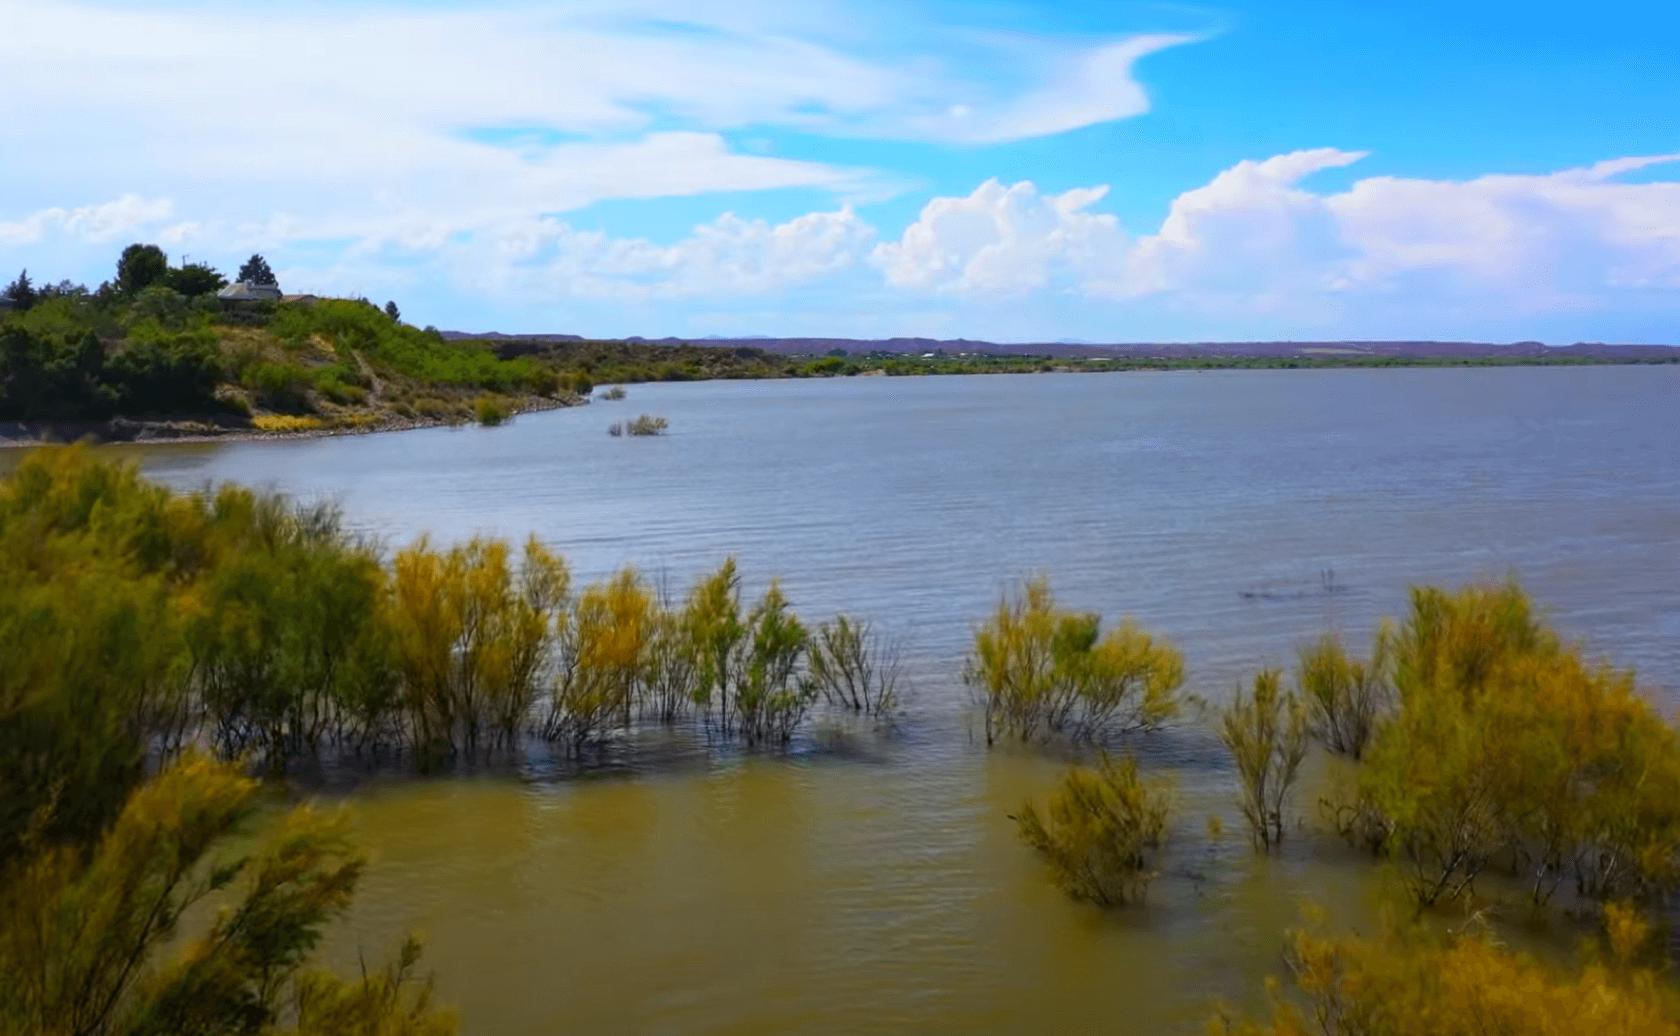 Caballo-Lake-Fishing-Guide-05-1